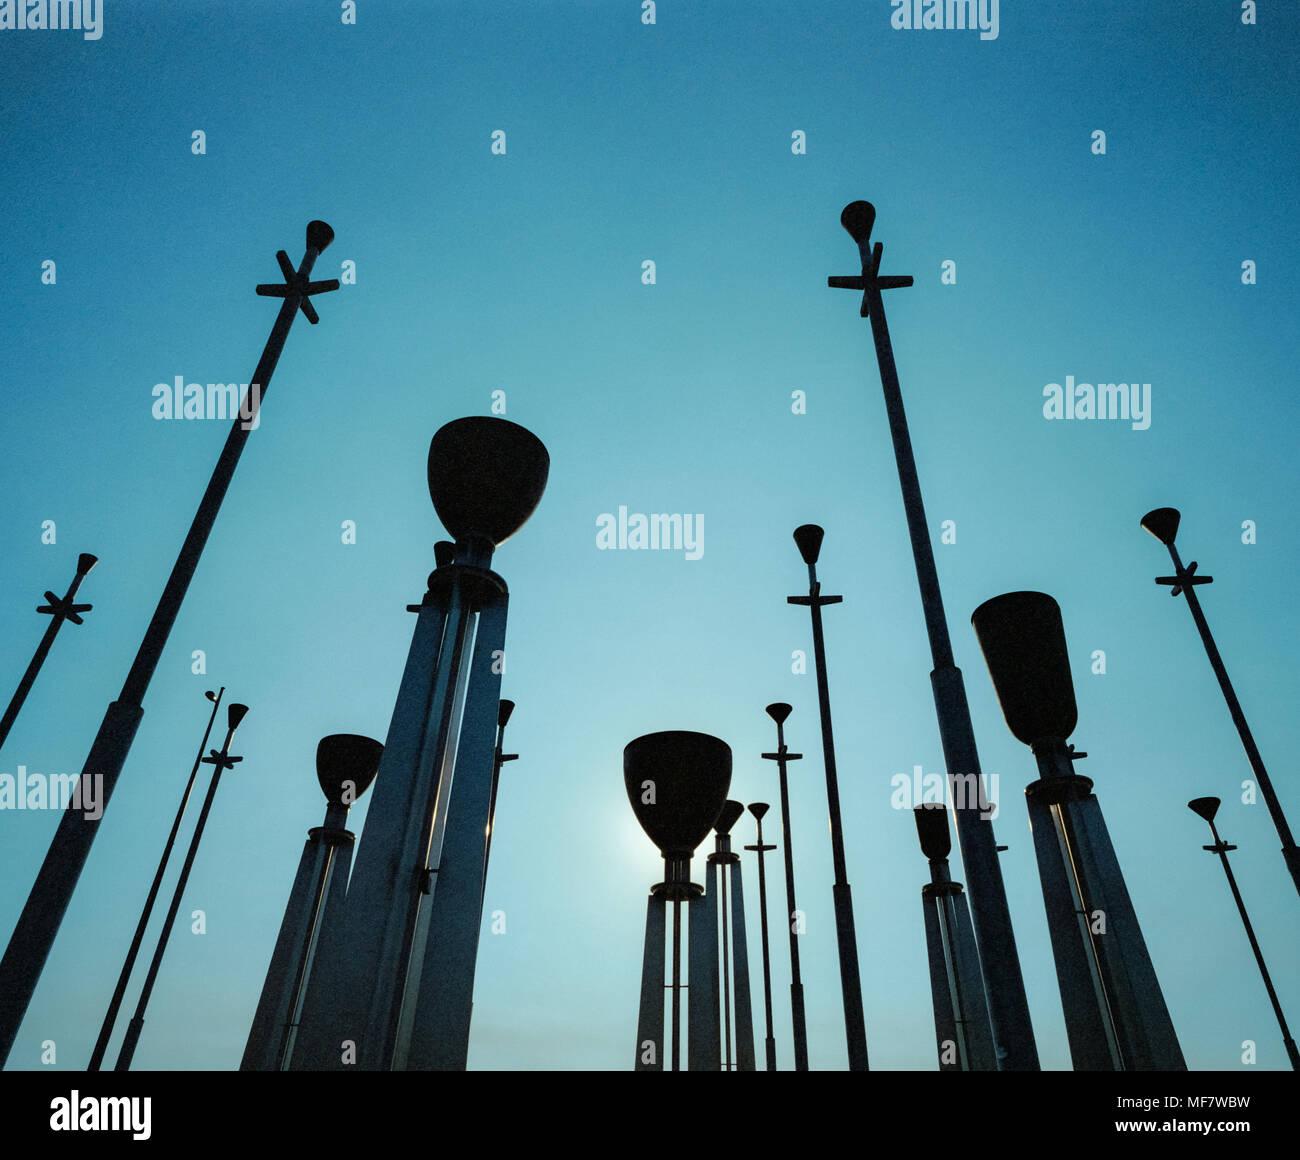 Silhouette of the Federation Bells, Birrarung Marr, Melbourne, Victoria, Australia - Stock Image